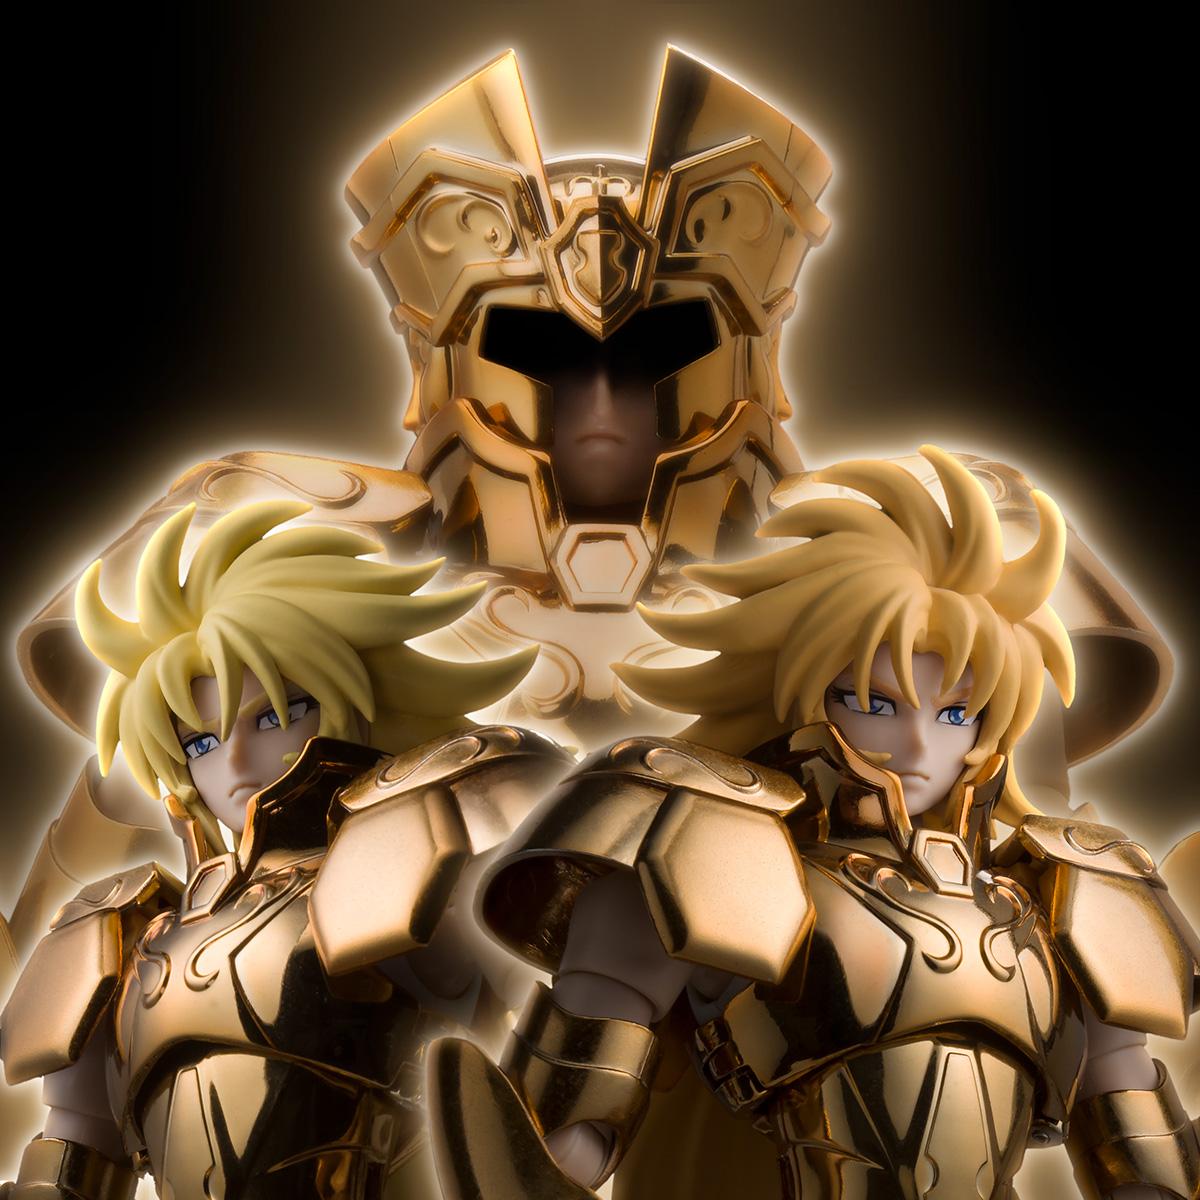 Saint Cloth Myth EX GEMINI SAGA KANON -ORIGINAL COLOR EDITION-